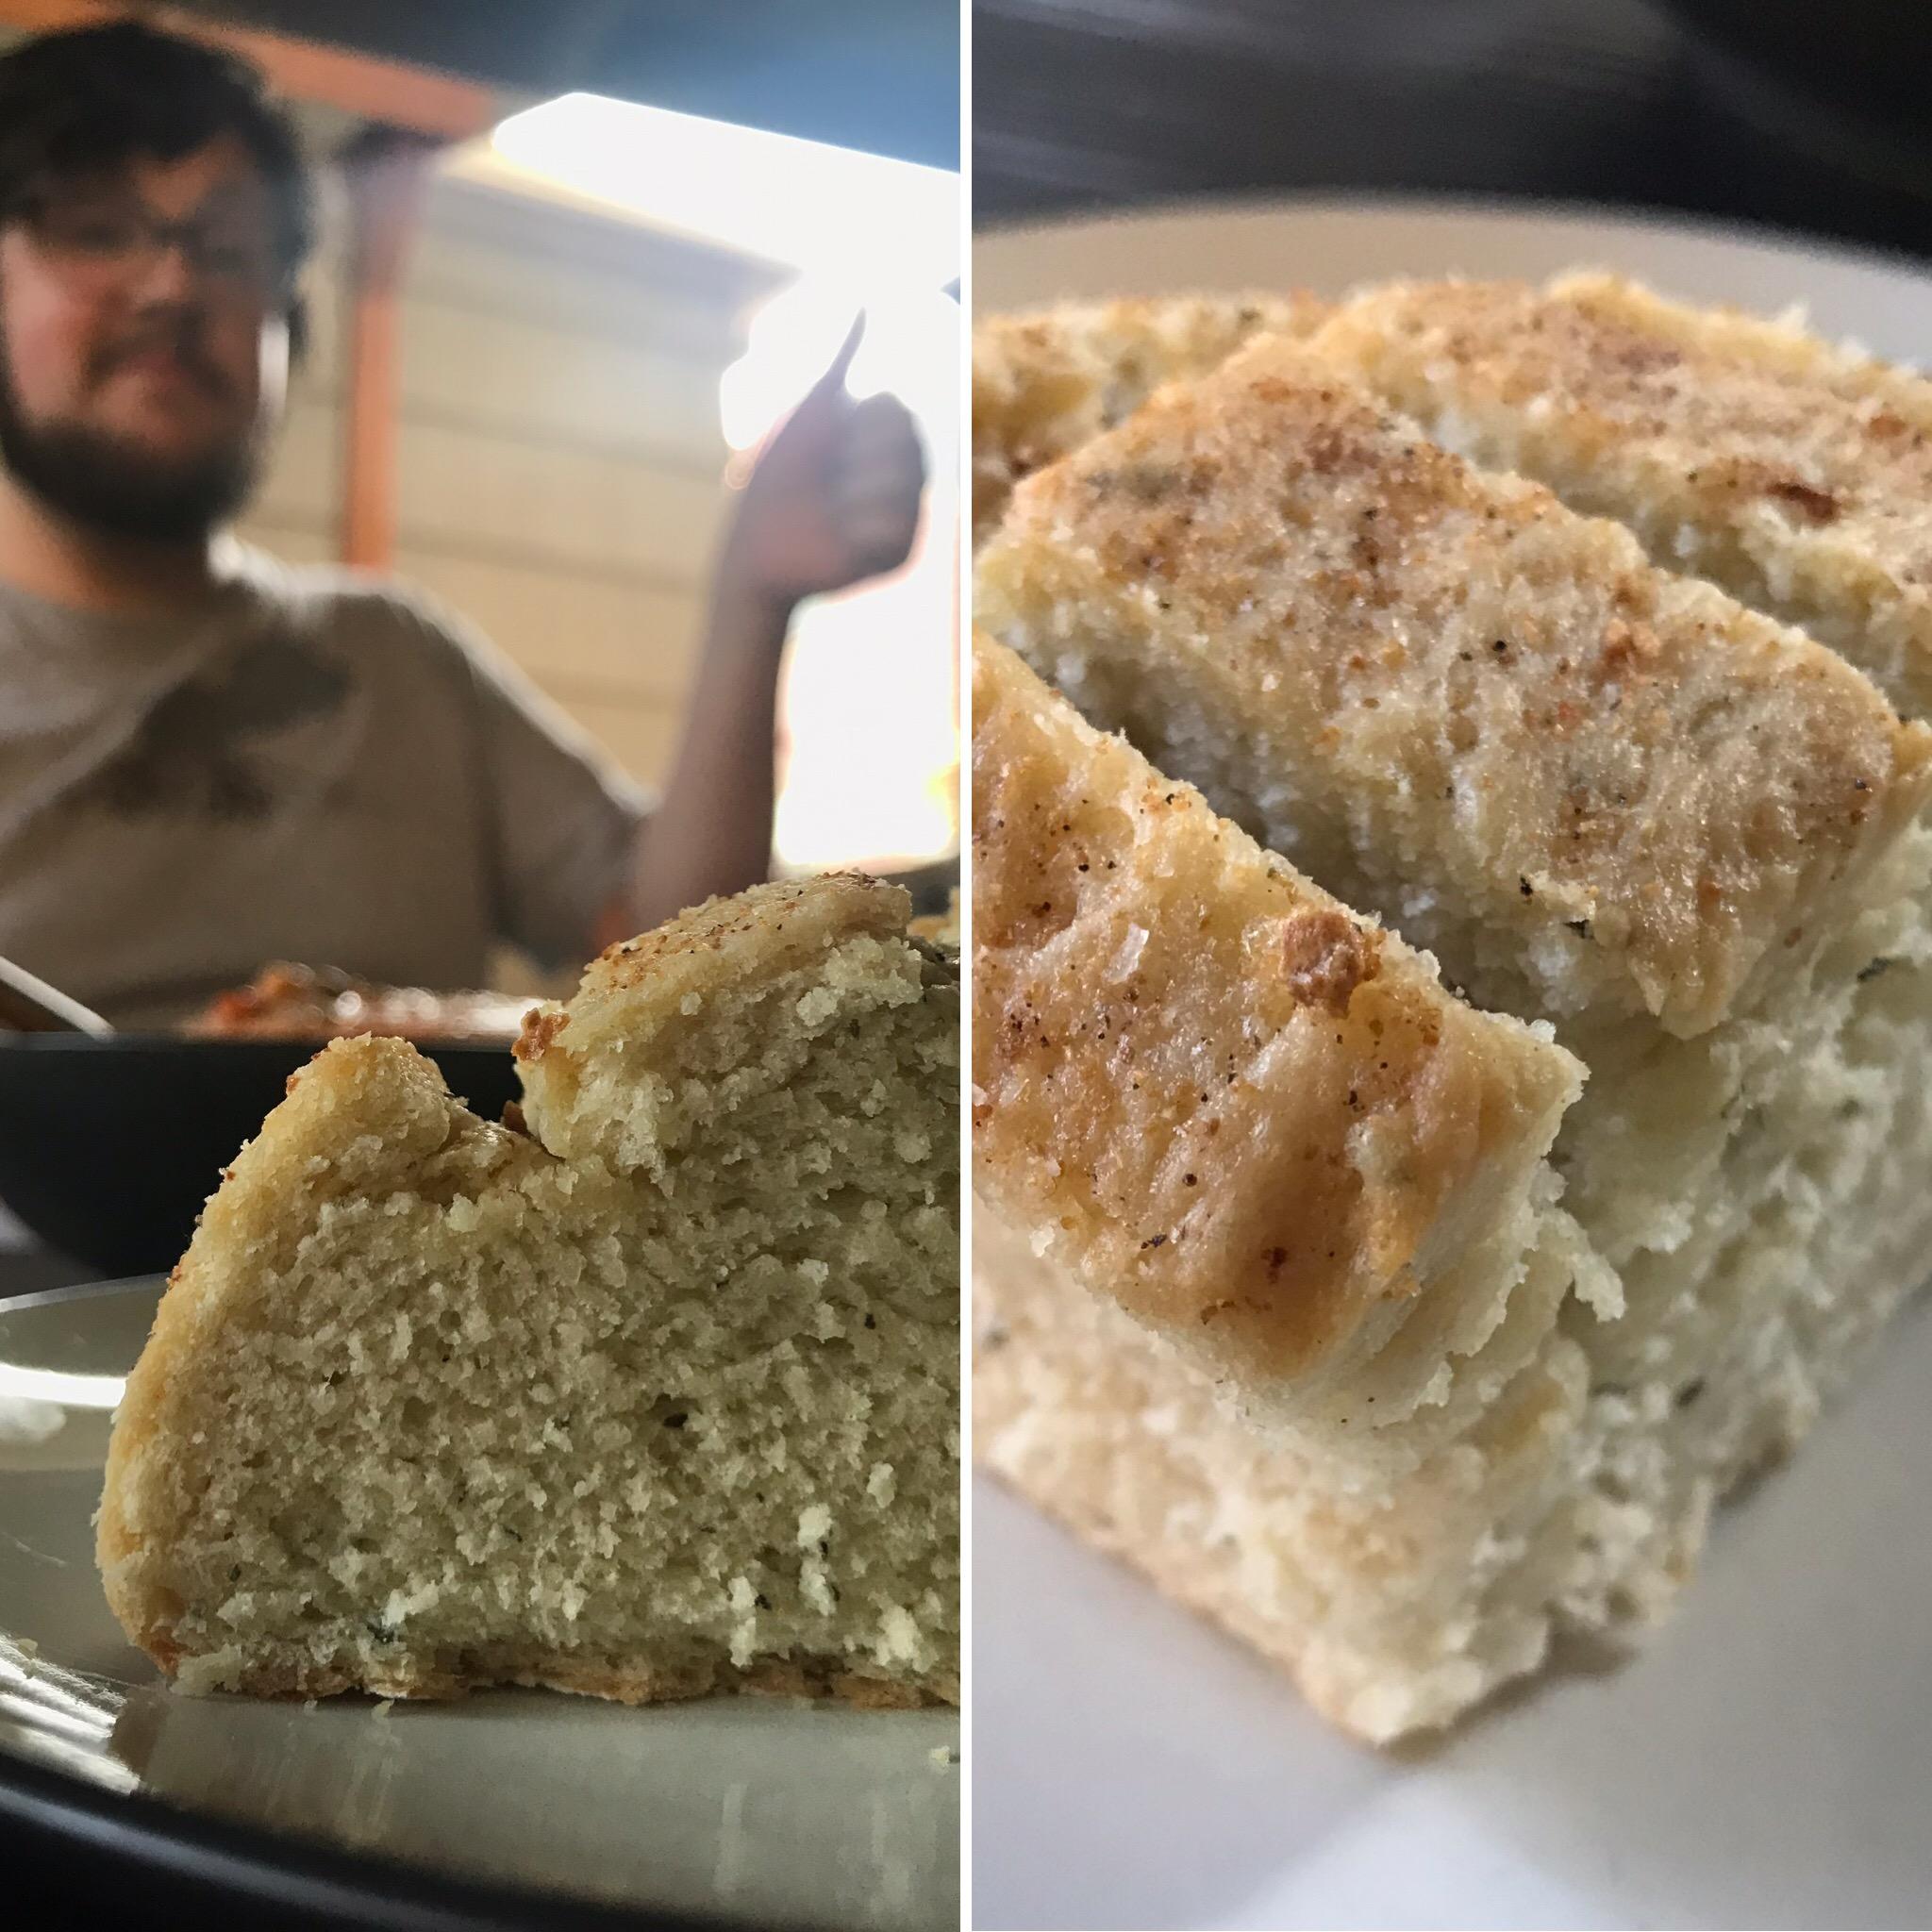 No Bugs, Just Bread